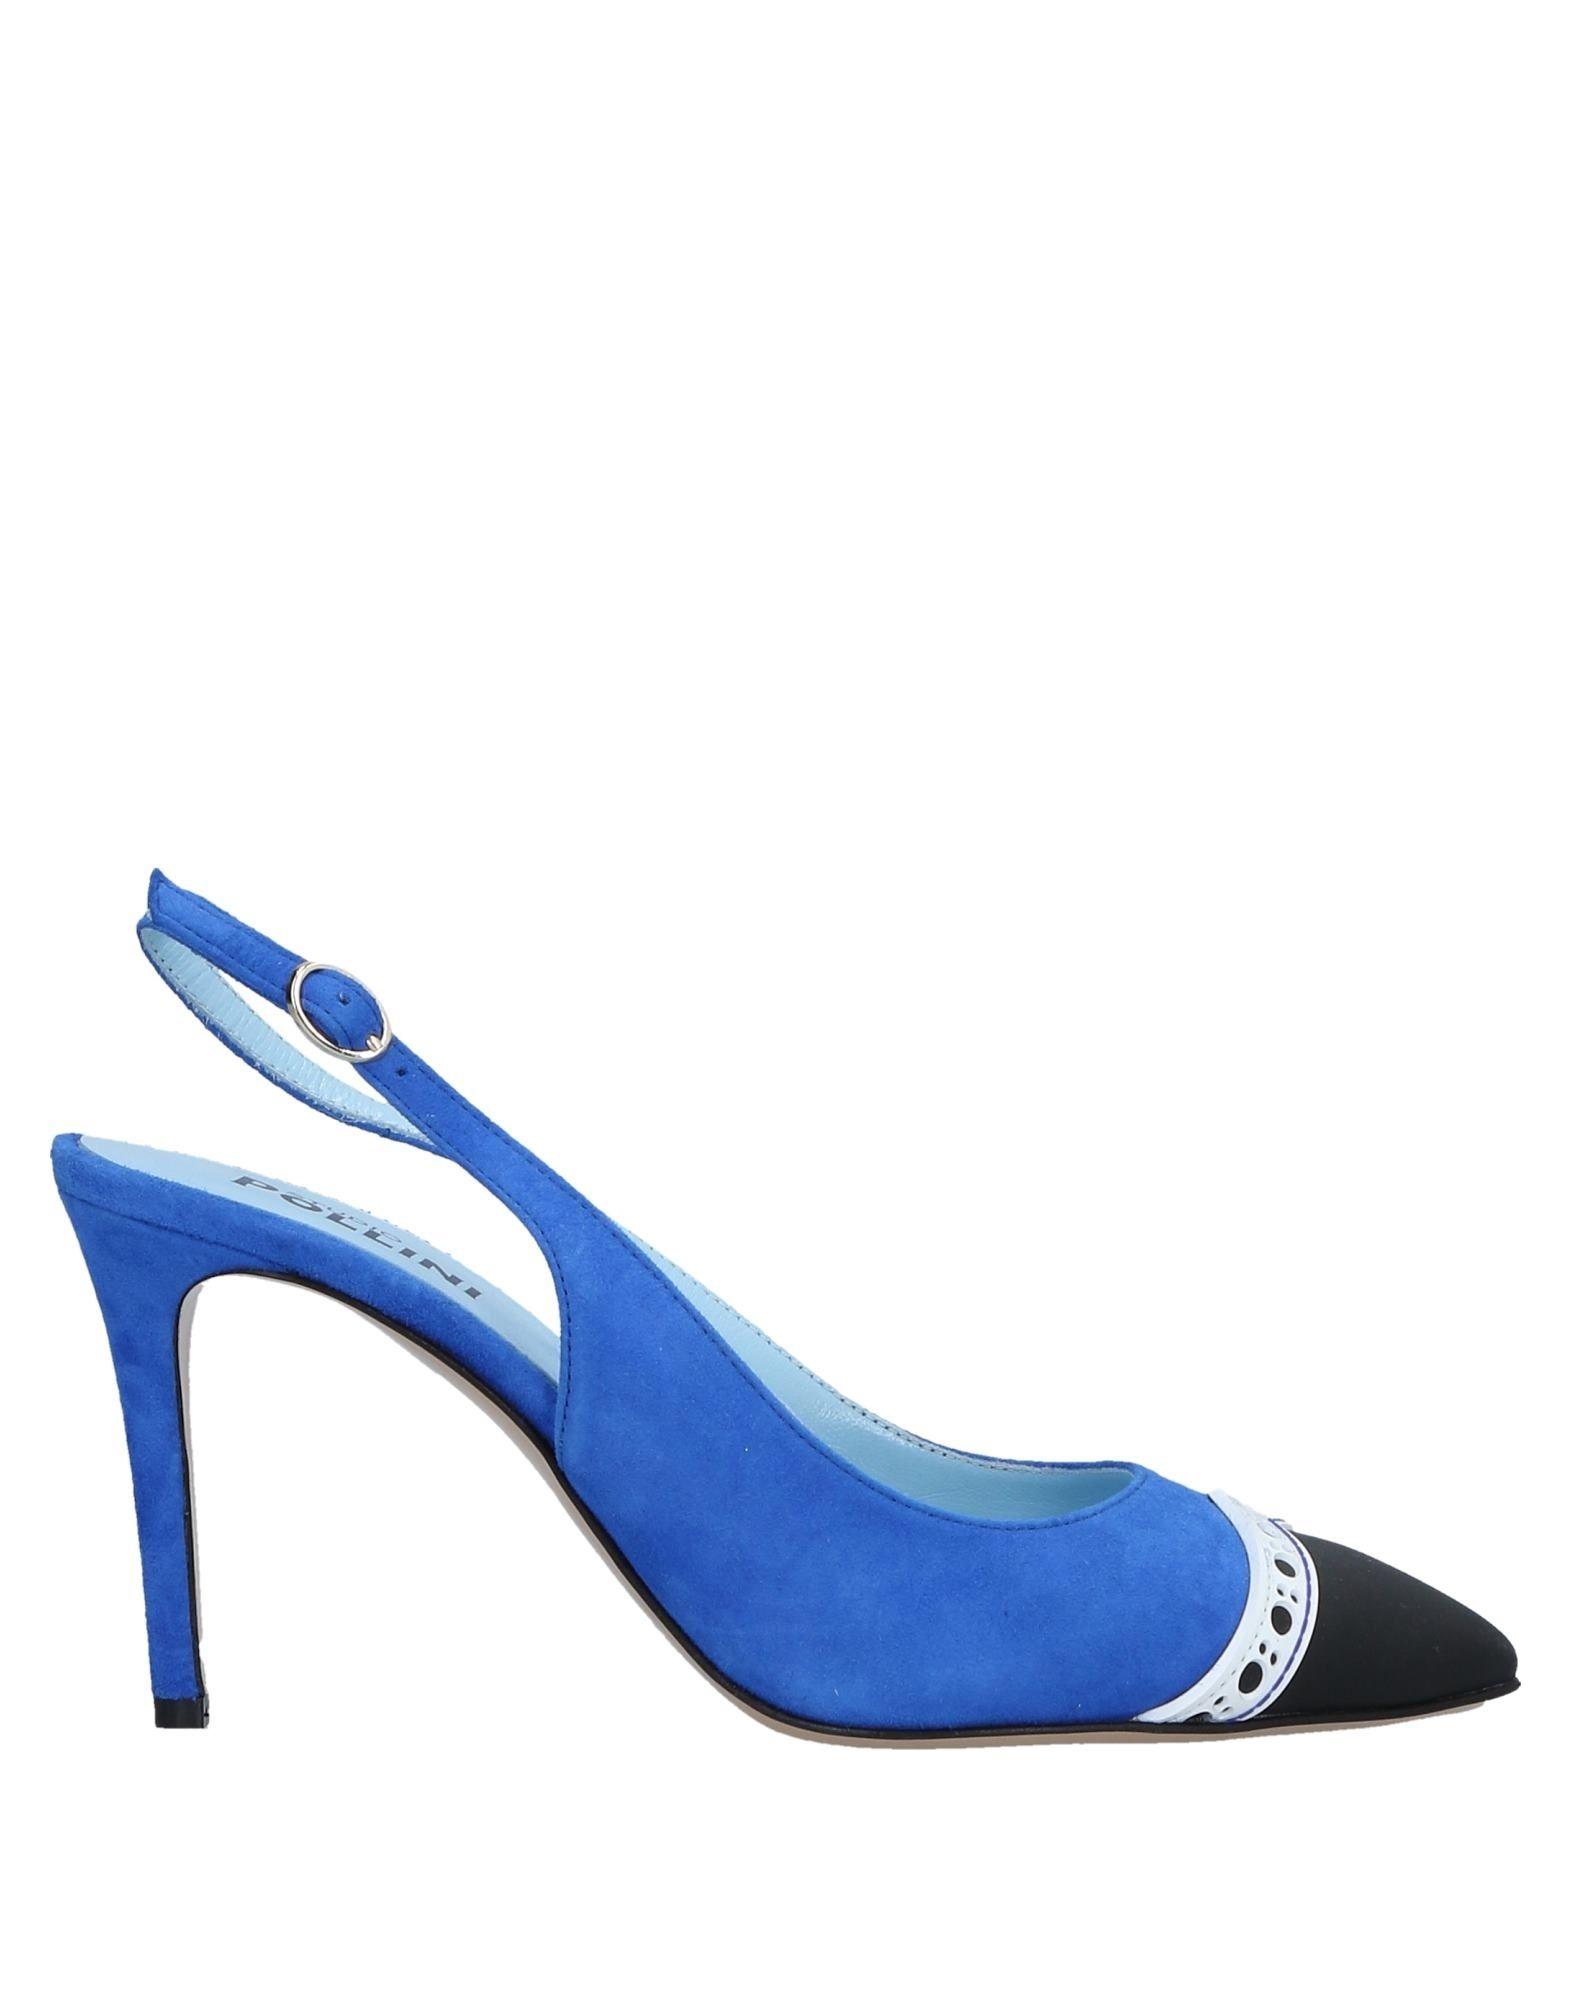 Stilvolle billige Schuhe Damen Studio Pollini Pumps Damen Schuhe  11538480ET eb93a5